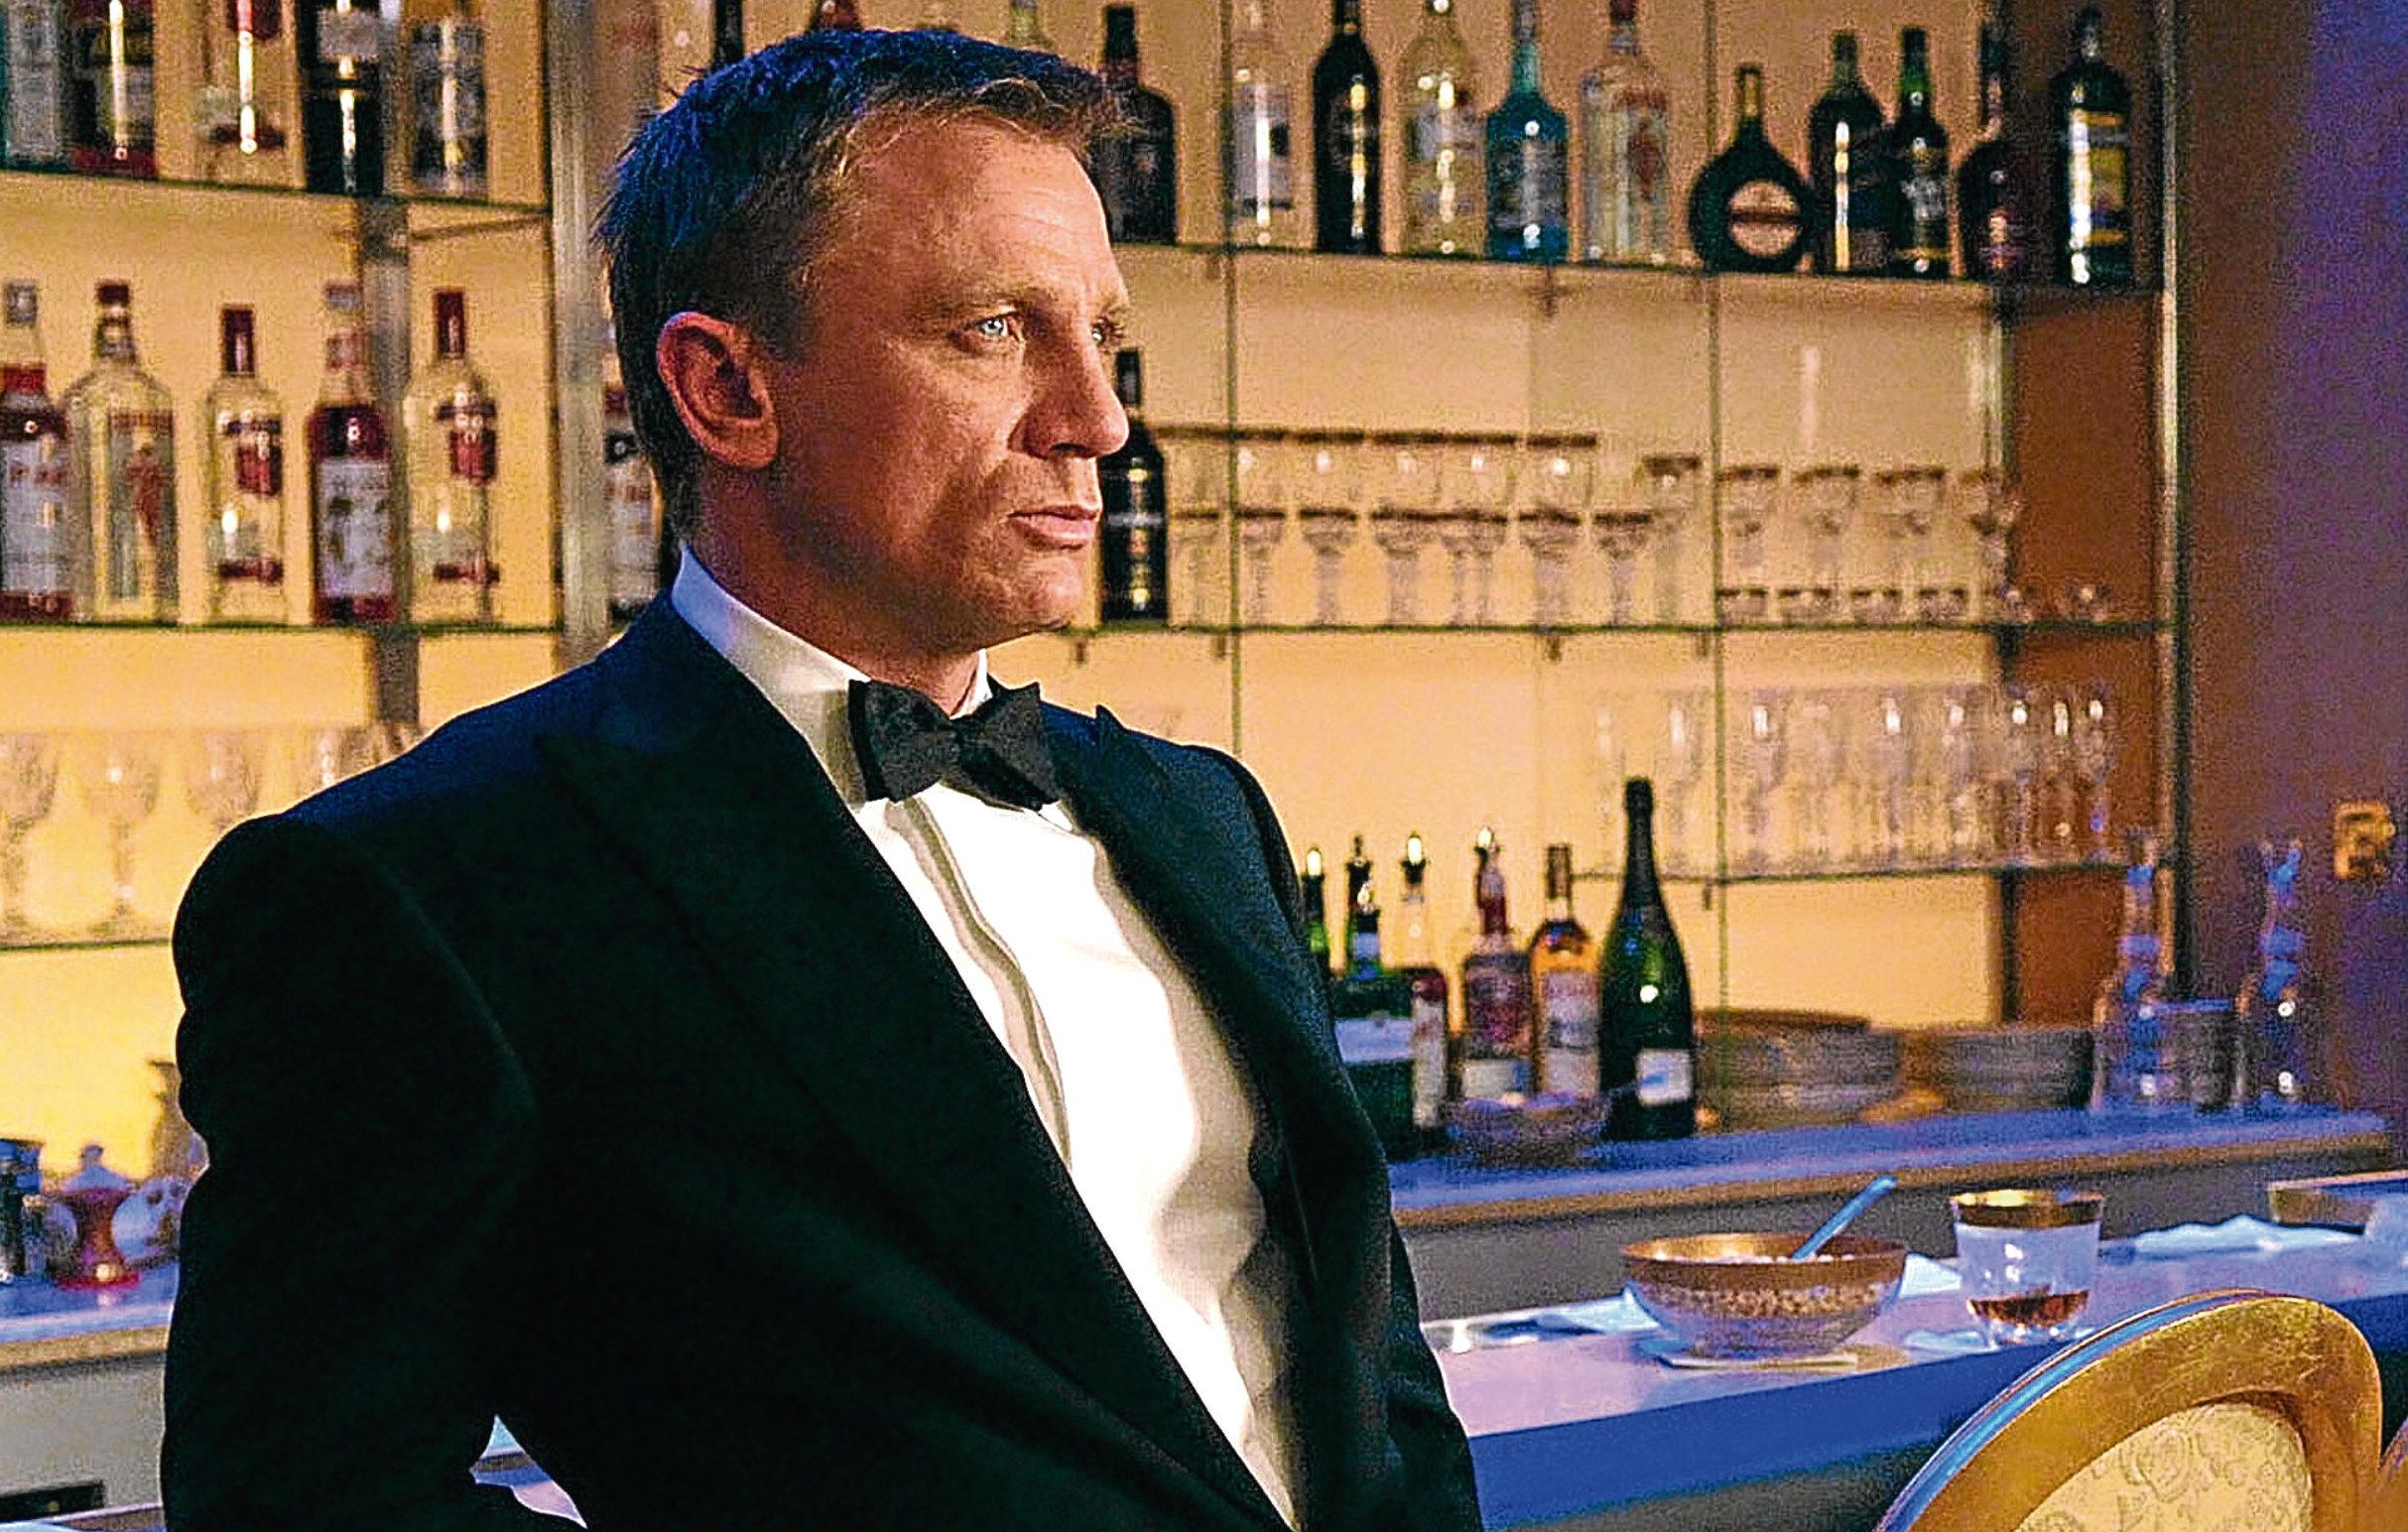 Daniel Craig in Casino Royale (Allstar/UNITED ARTISTS/COLUMBIA PICTURES)